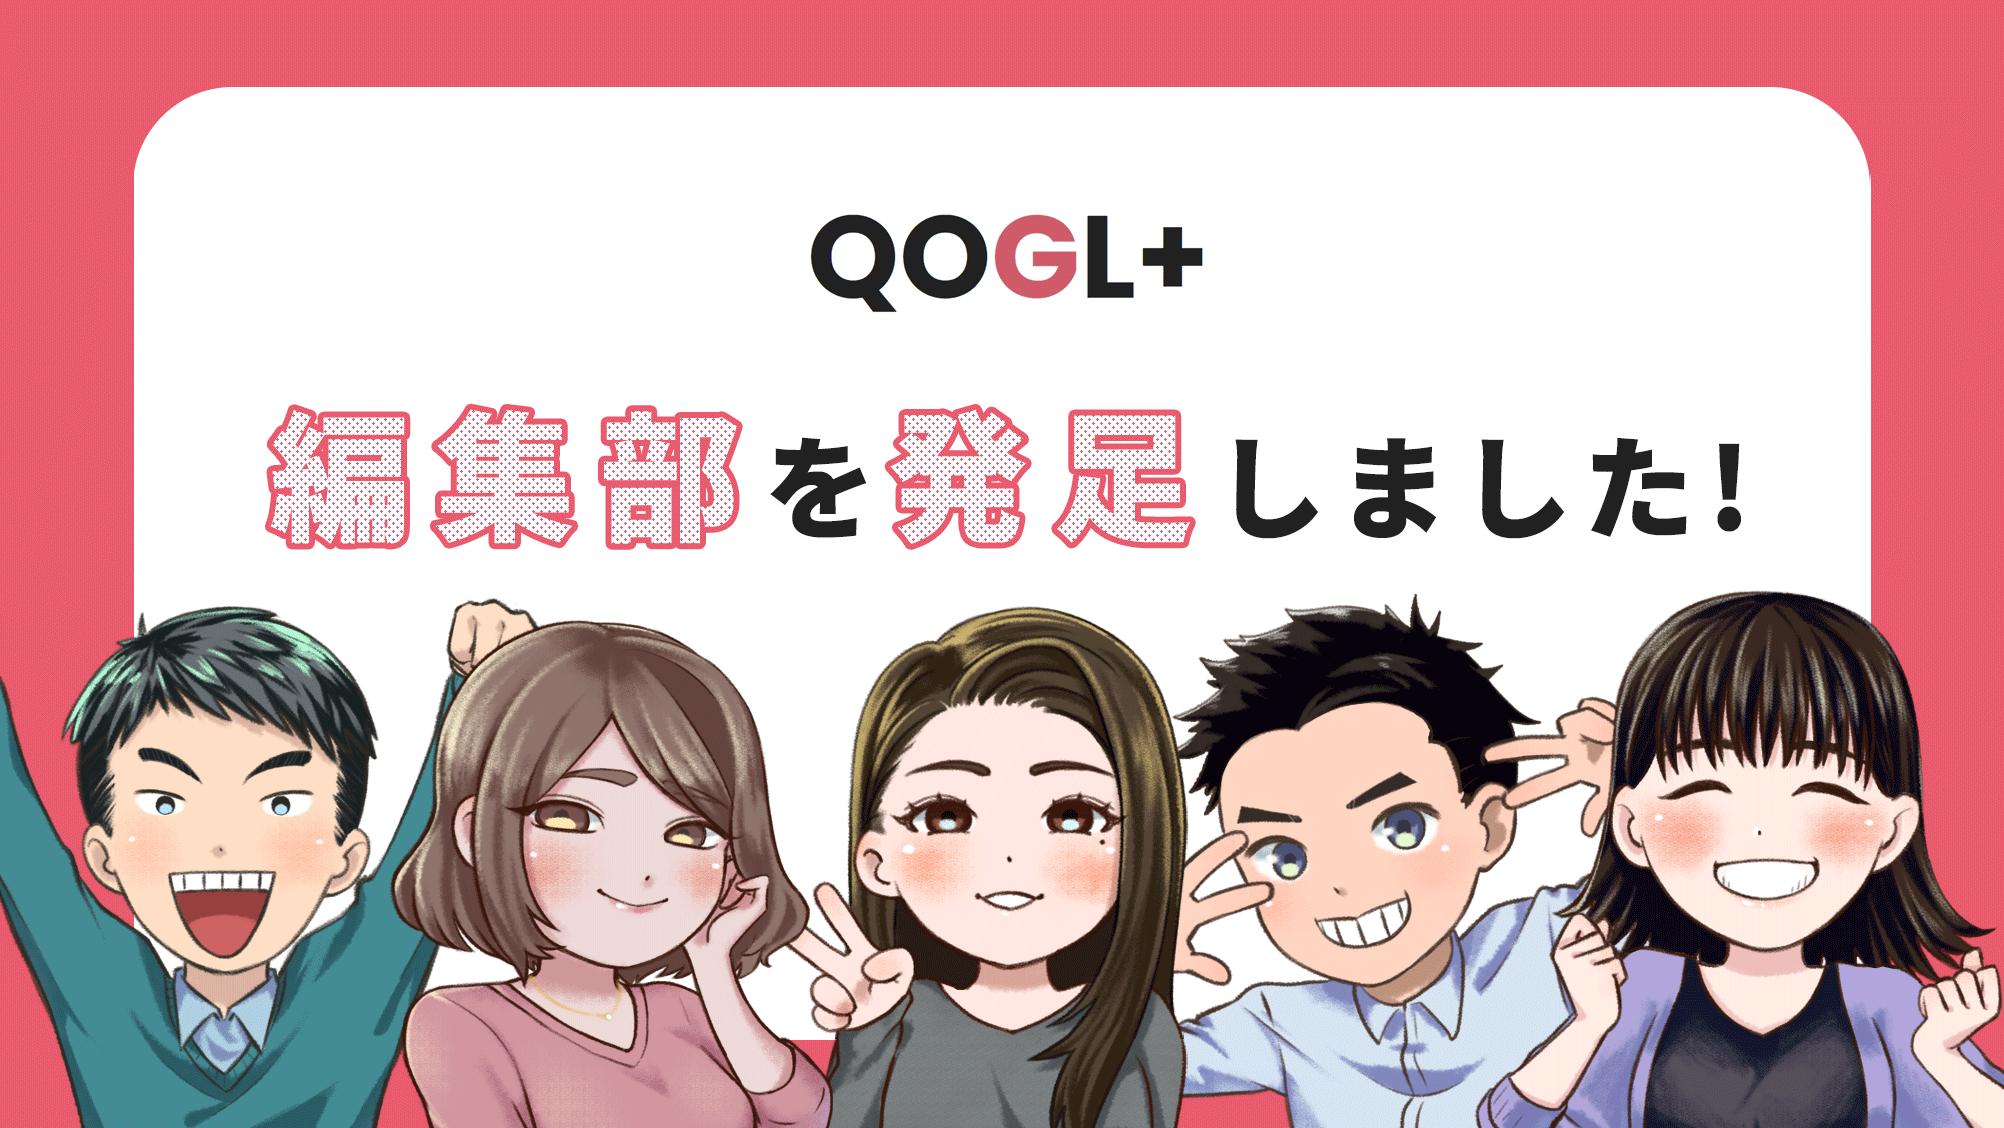 QOGL+編集部を発足しました